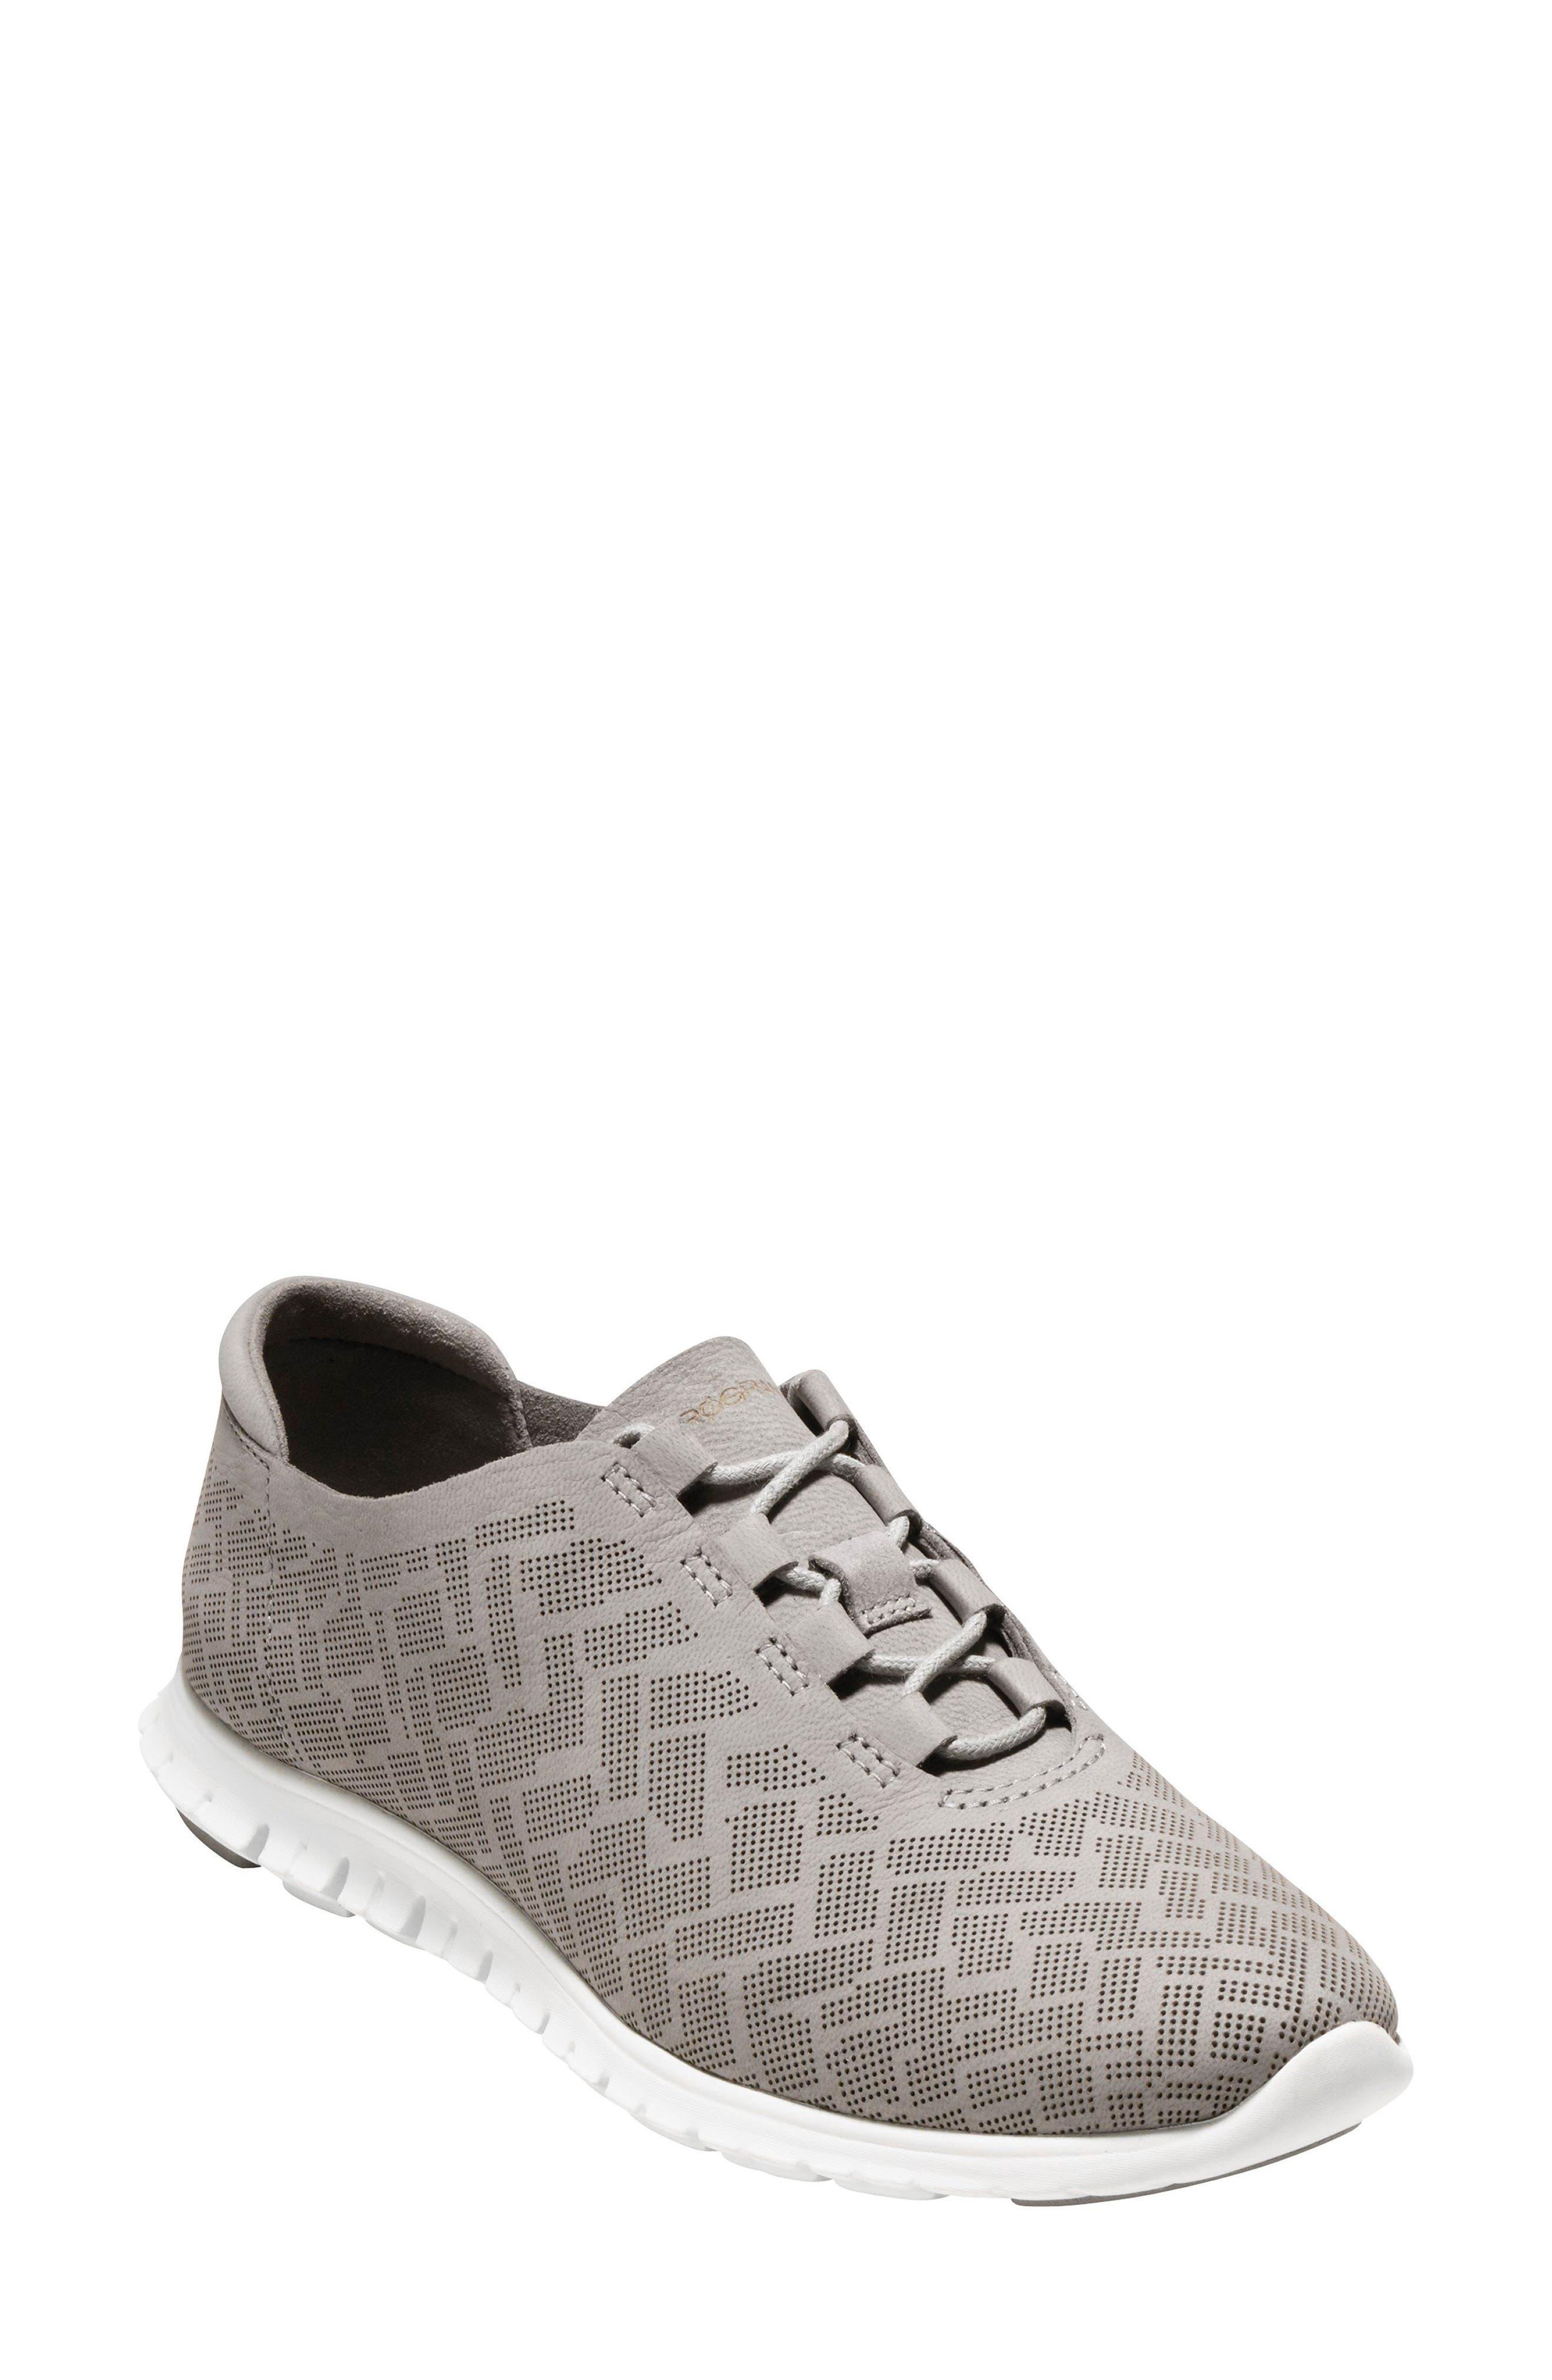 ZERØGRAND Genevieve Perforated Sneaker,                         Main,                         color, Ironstone Perf Nubuck